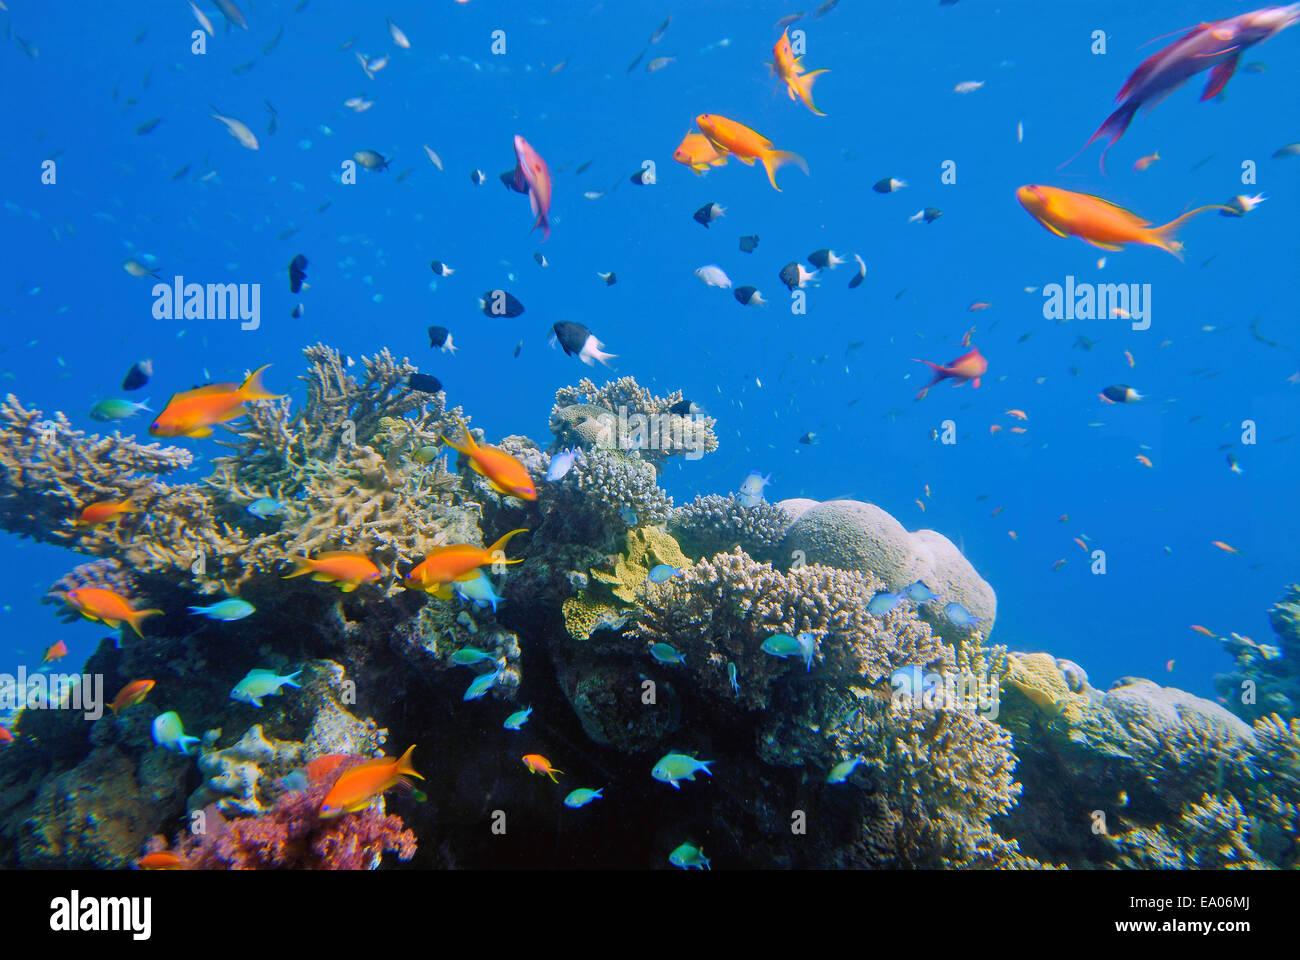 Sea life around Coral reef - Stock Image